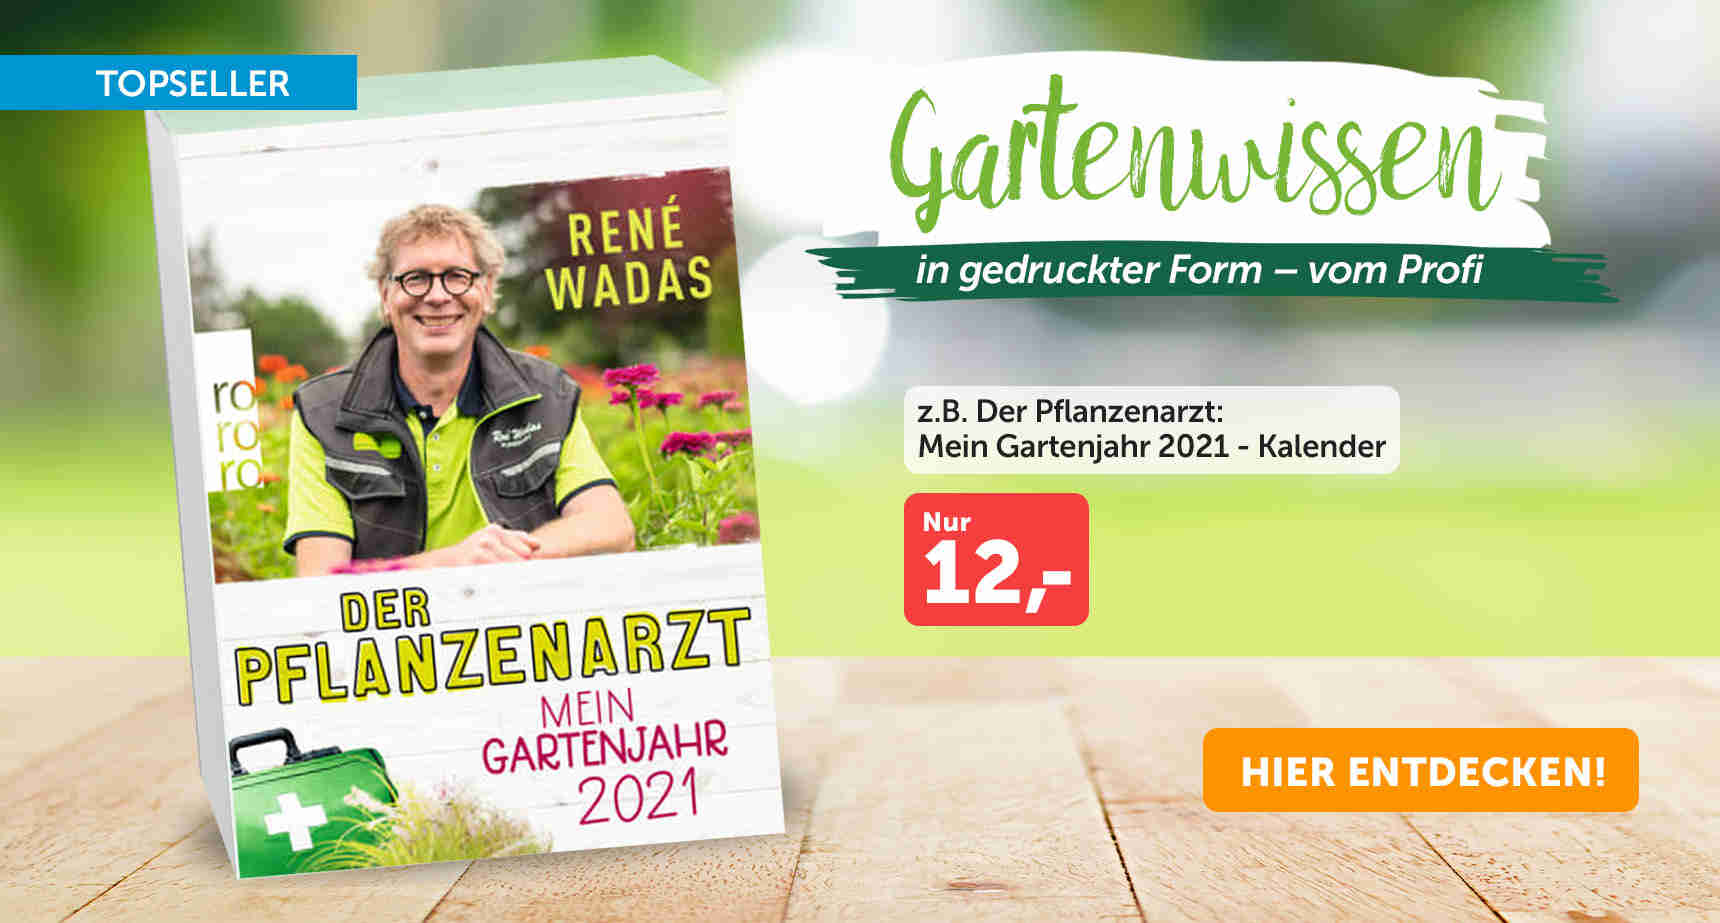 +++ (3) Gartenbuecher +++ - 3